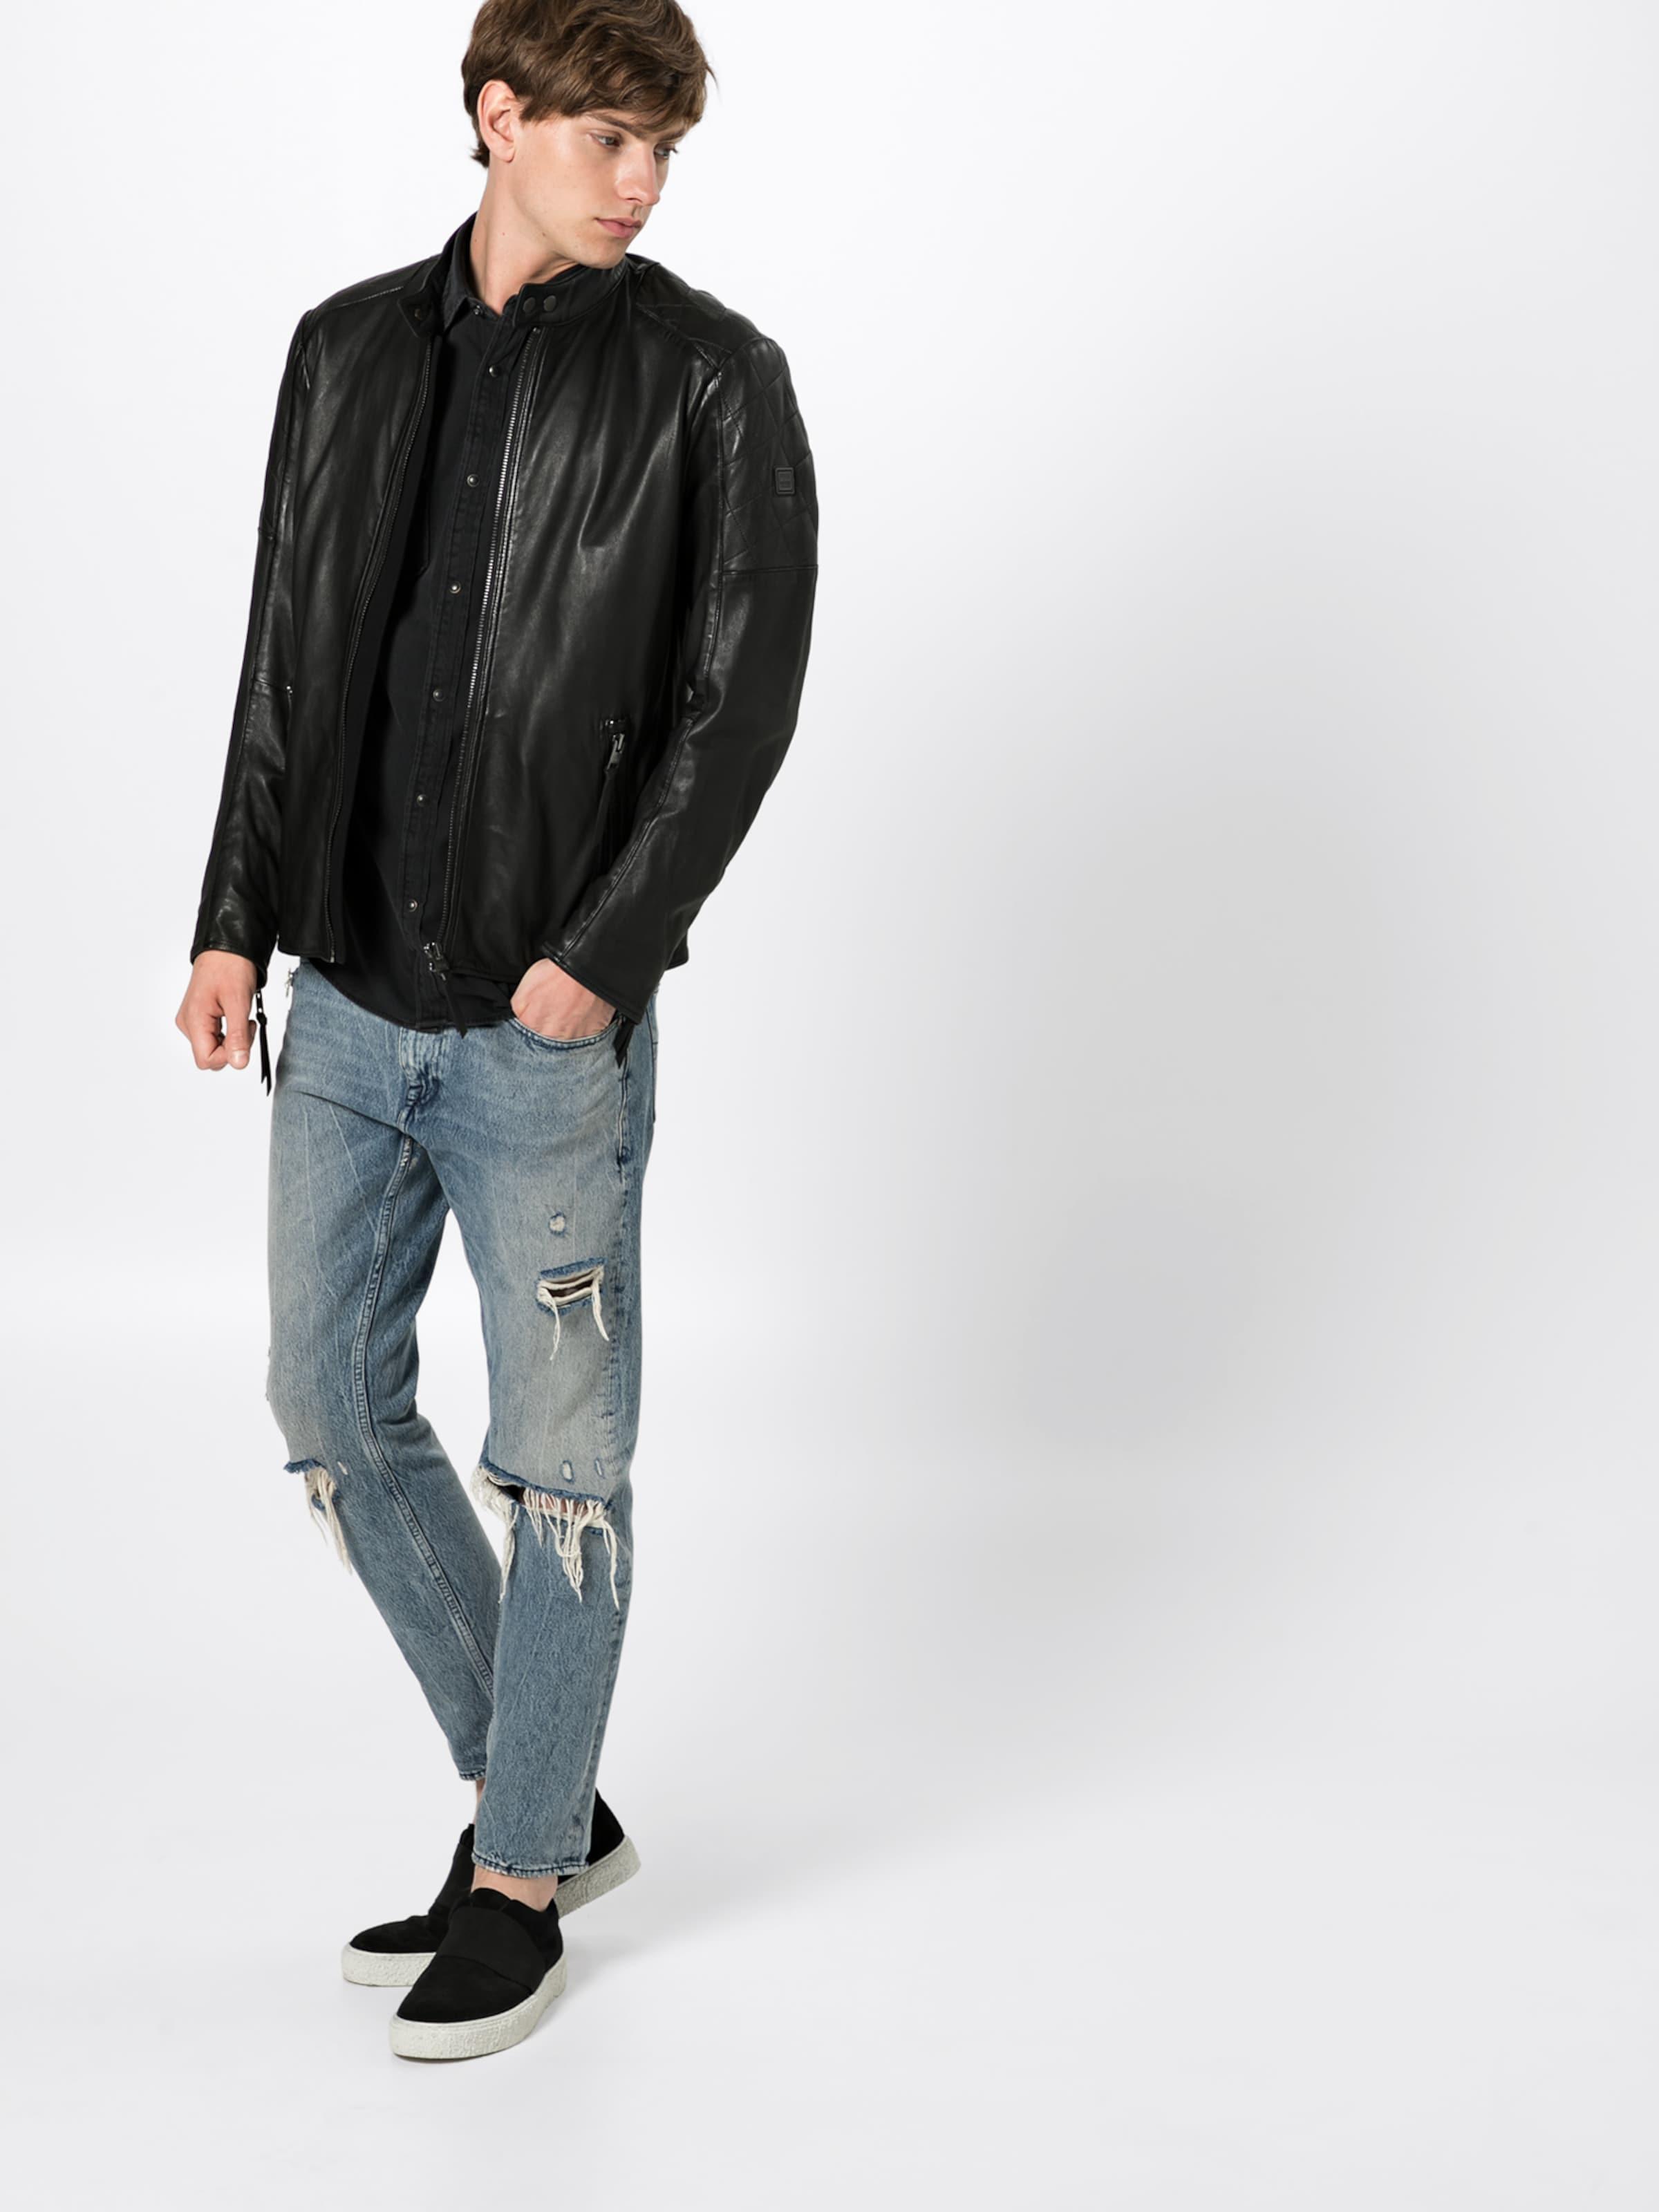 Noir s' 'jjesheridan Shirt Jackamp; Denim Jones Chemise En L dEQBexorCW